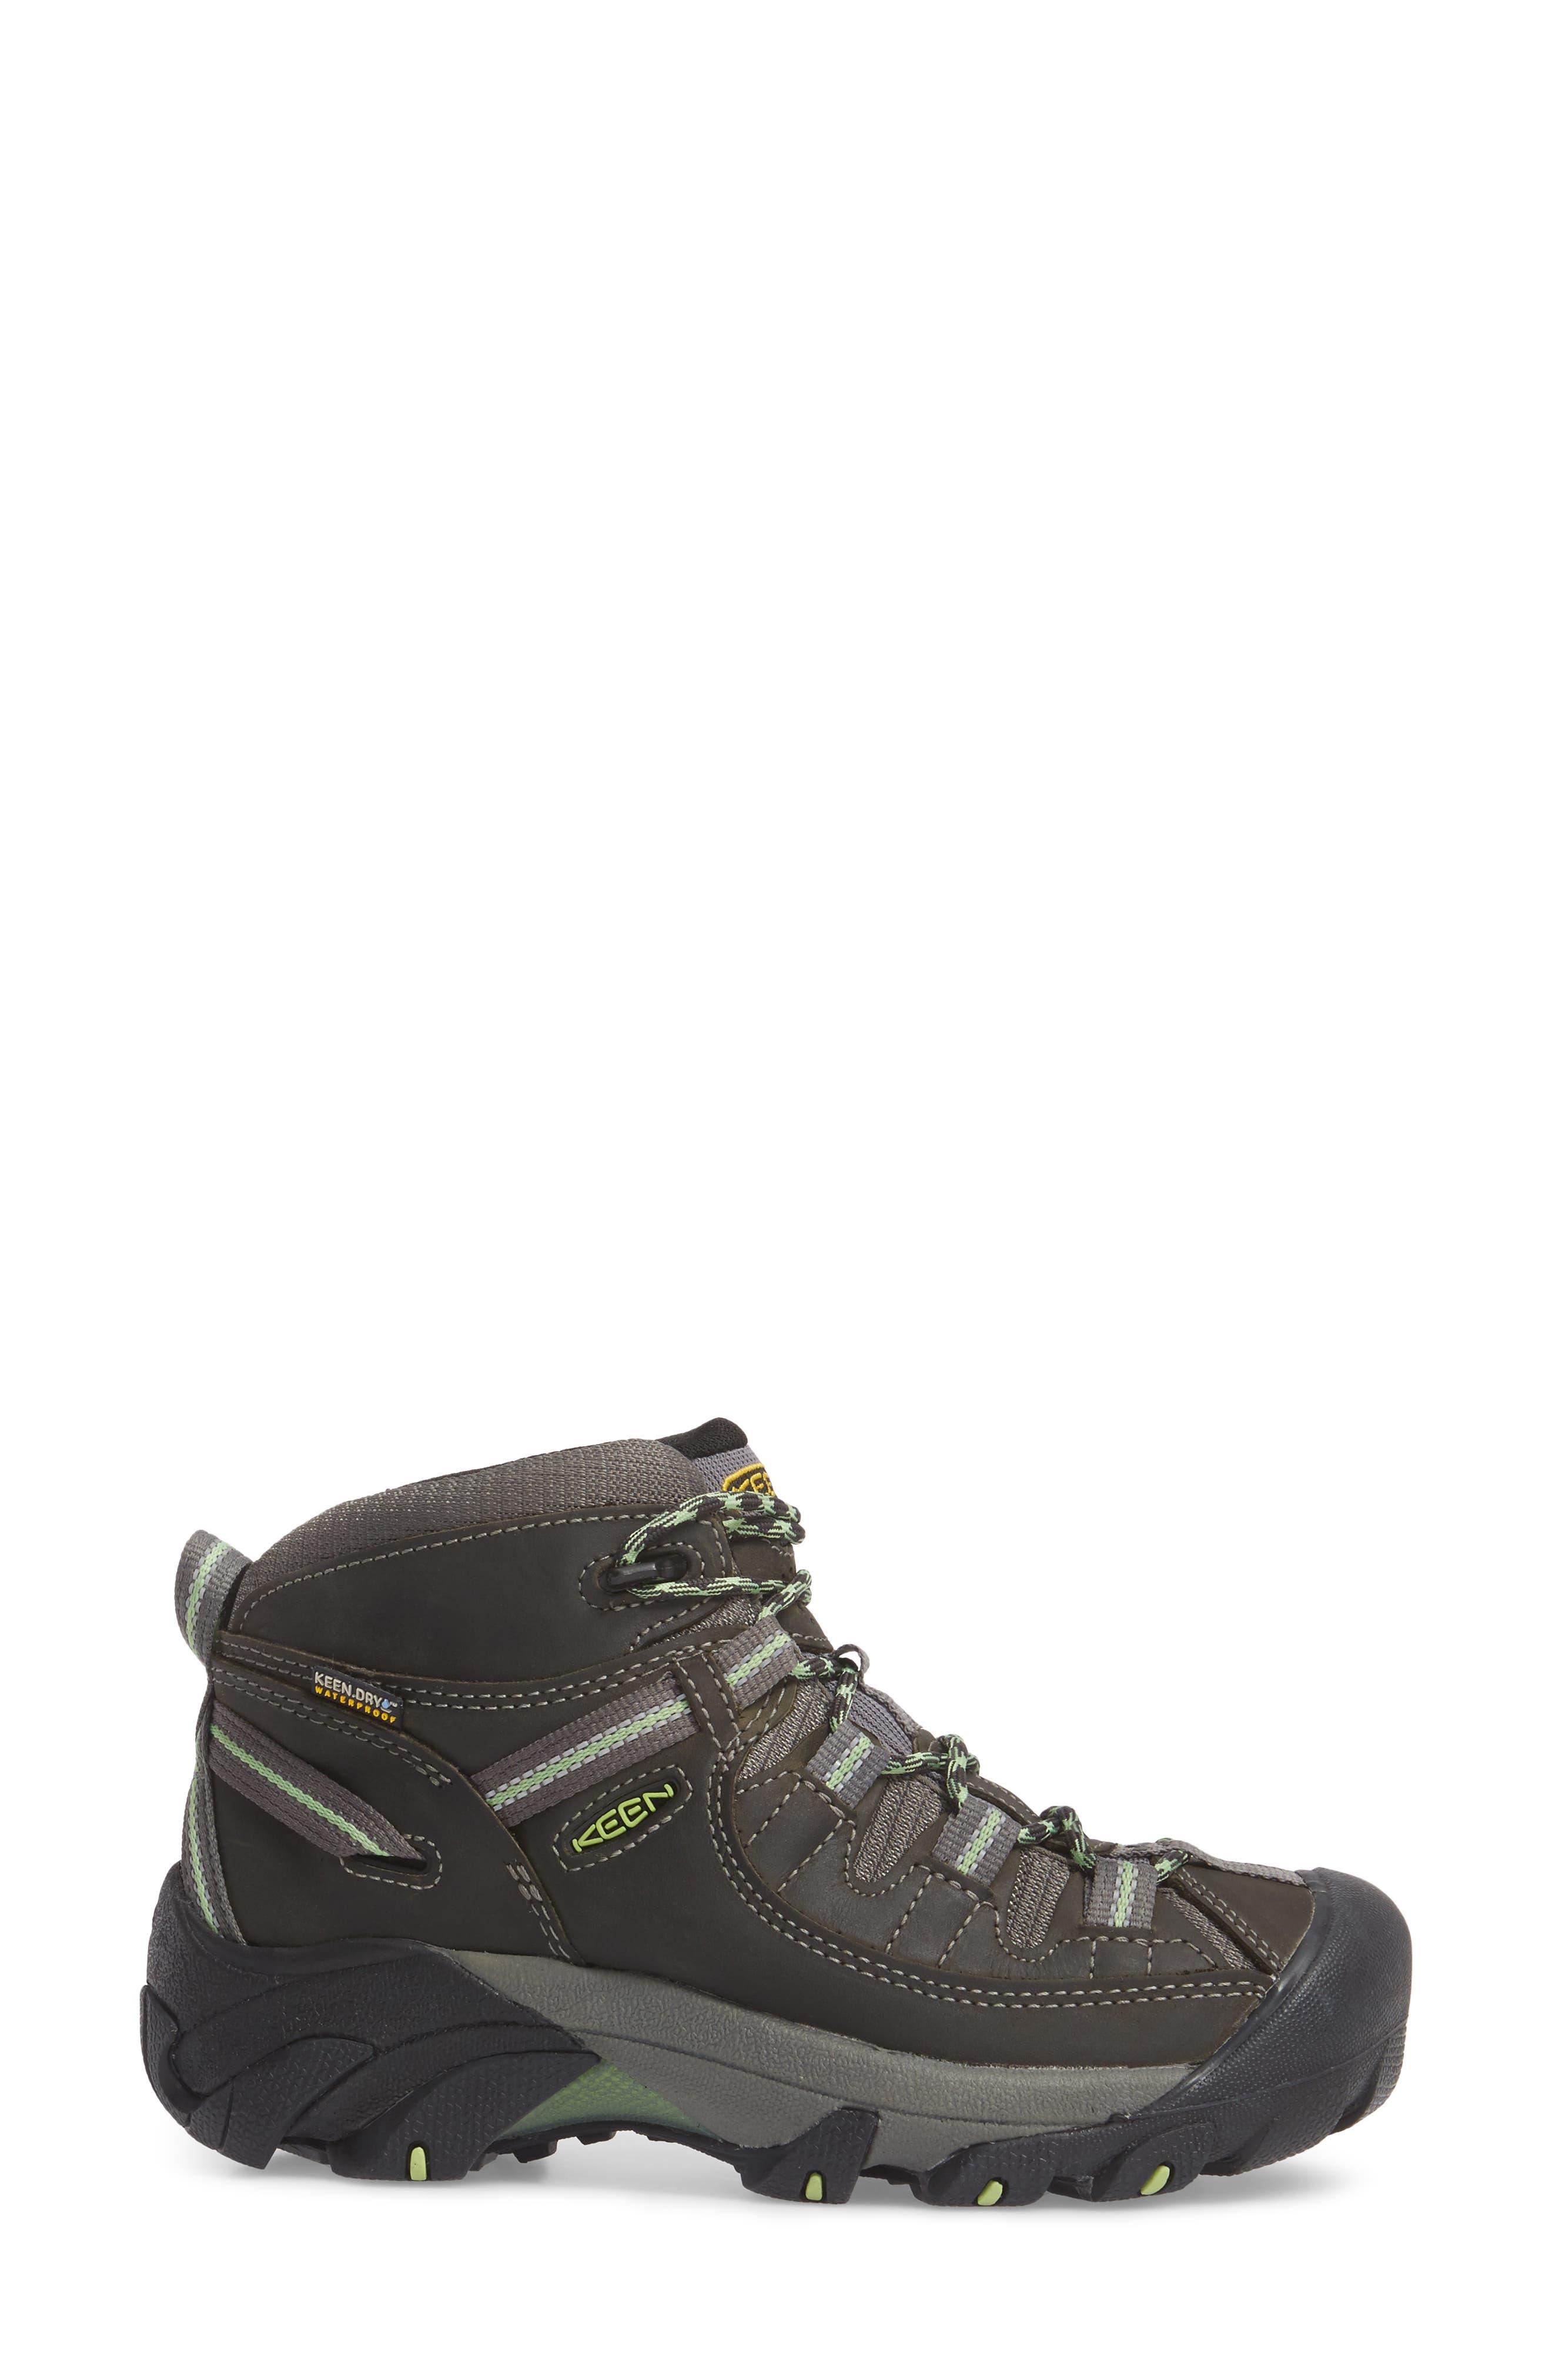 Alternate Image 3  - Keen Targhee II Mid Waterproof Hiking Boot (Women)